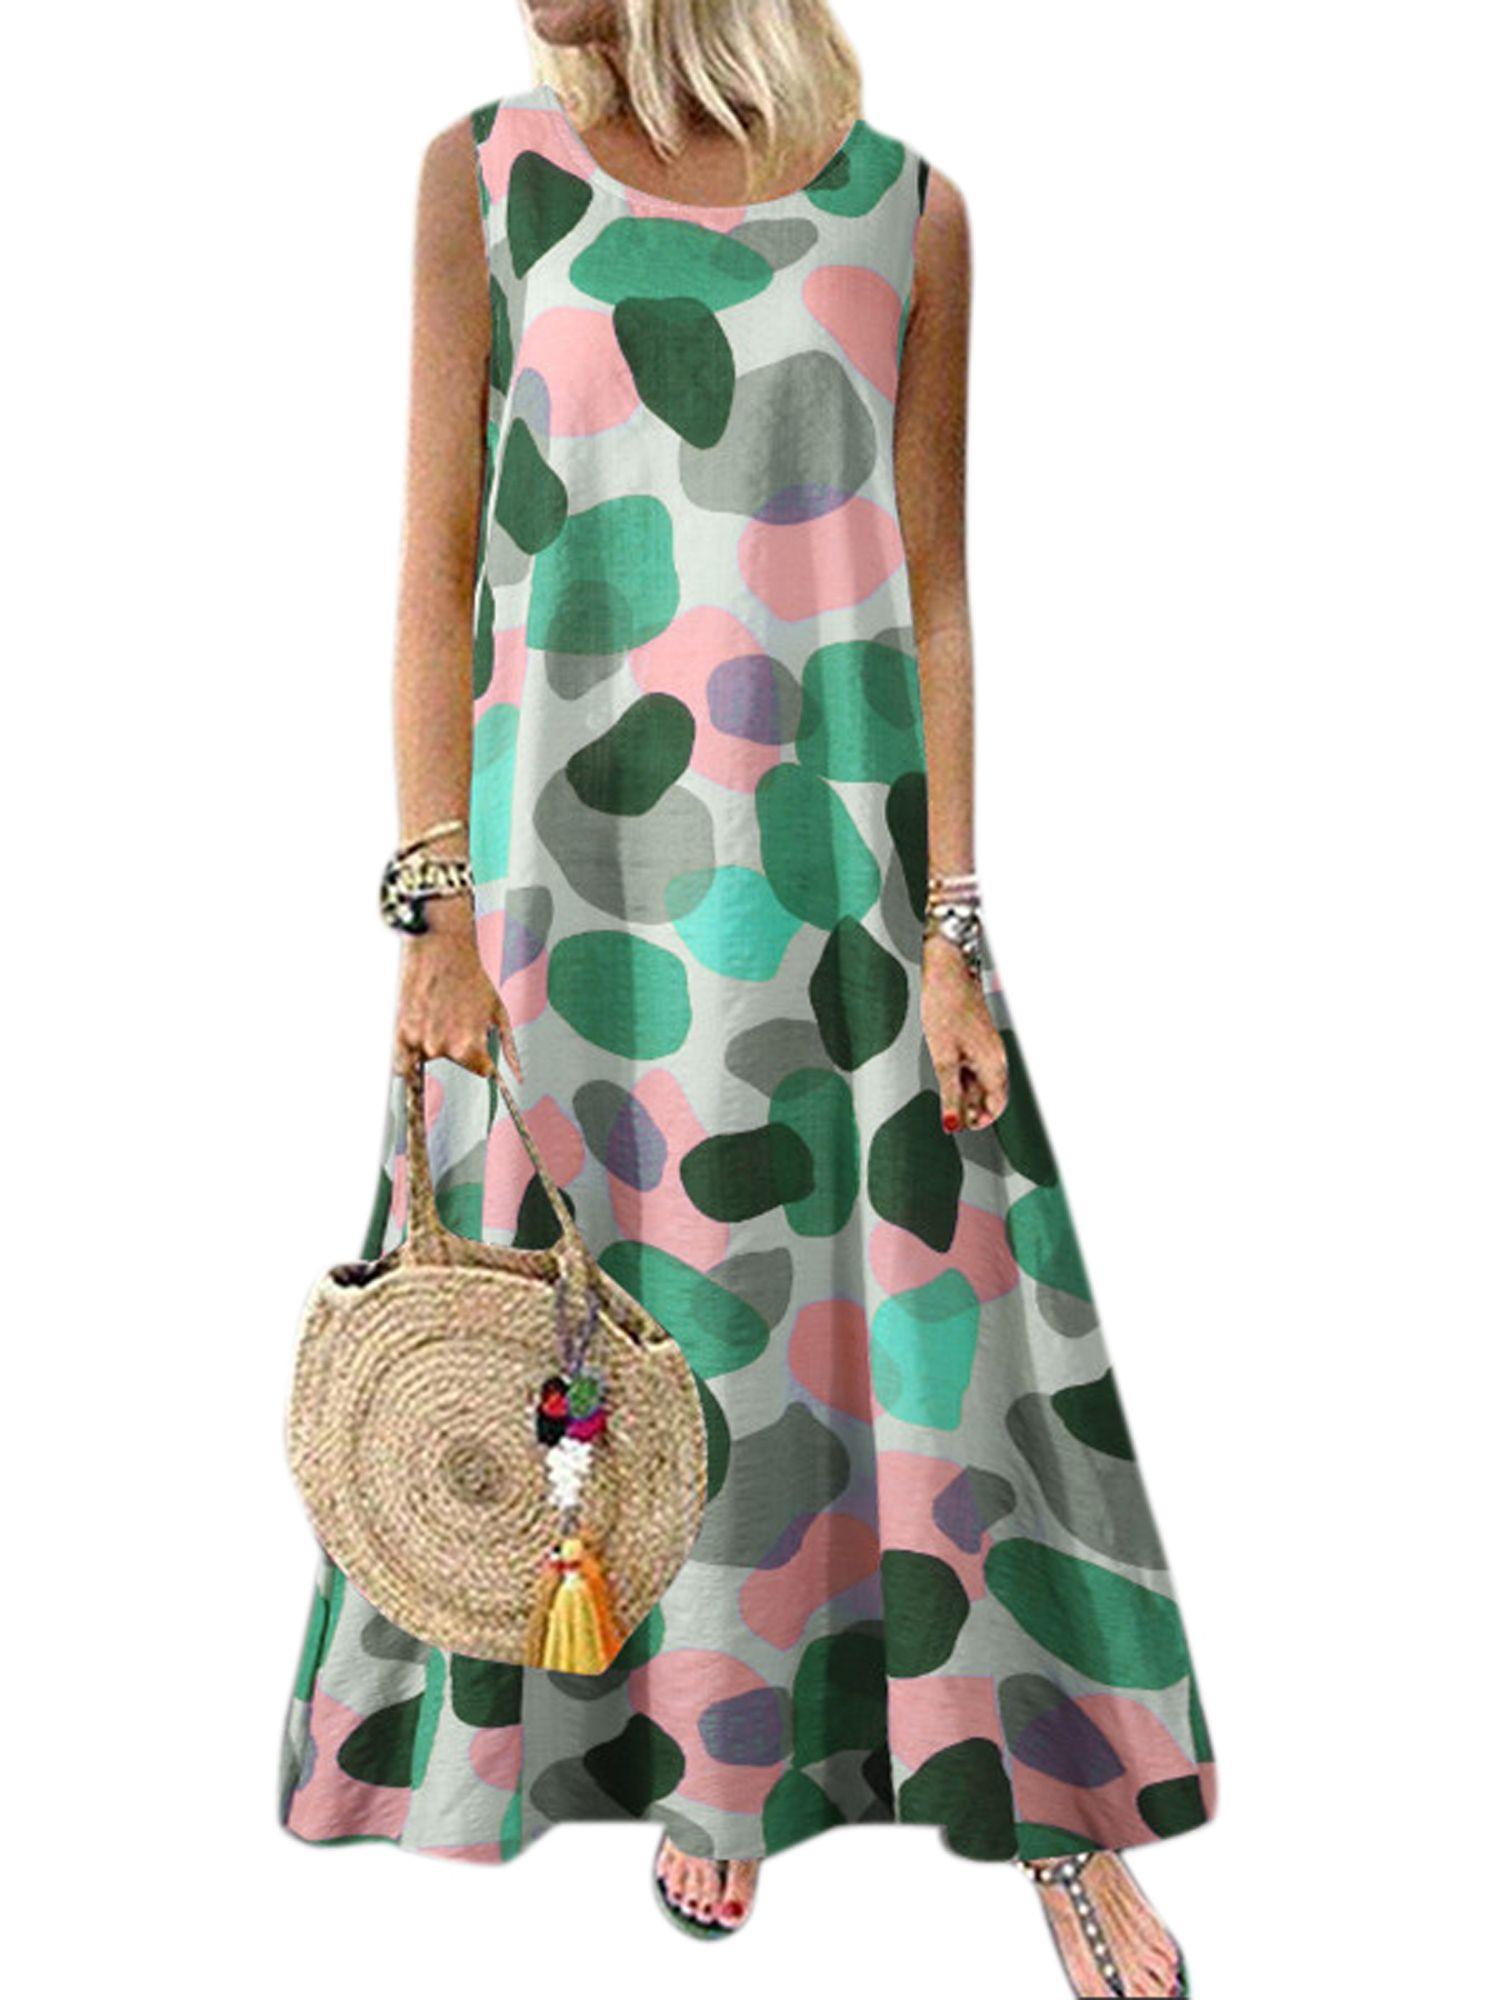 Wodstyle Women S Summer Boho Maxi Dress Sleeveless Plus Size Casual Beach Swing Sundress Walmart Com Work Dresses For Women Summer Maxi Dress Boho Boho Maxi Dress [ 2000 x 1500 Pixel ]